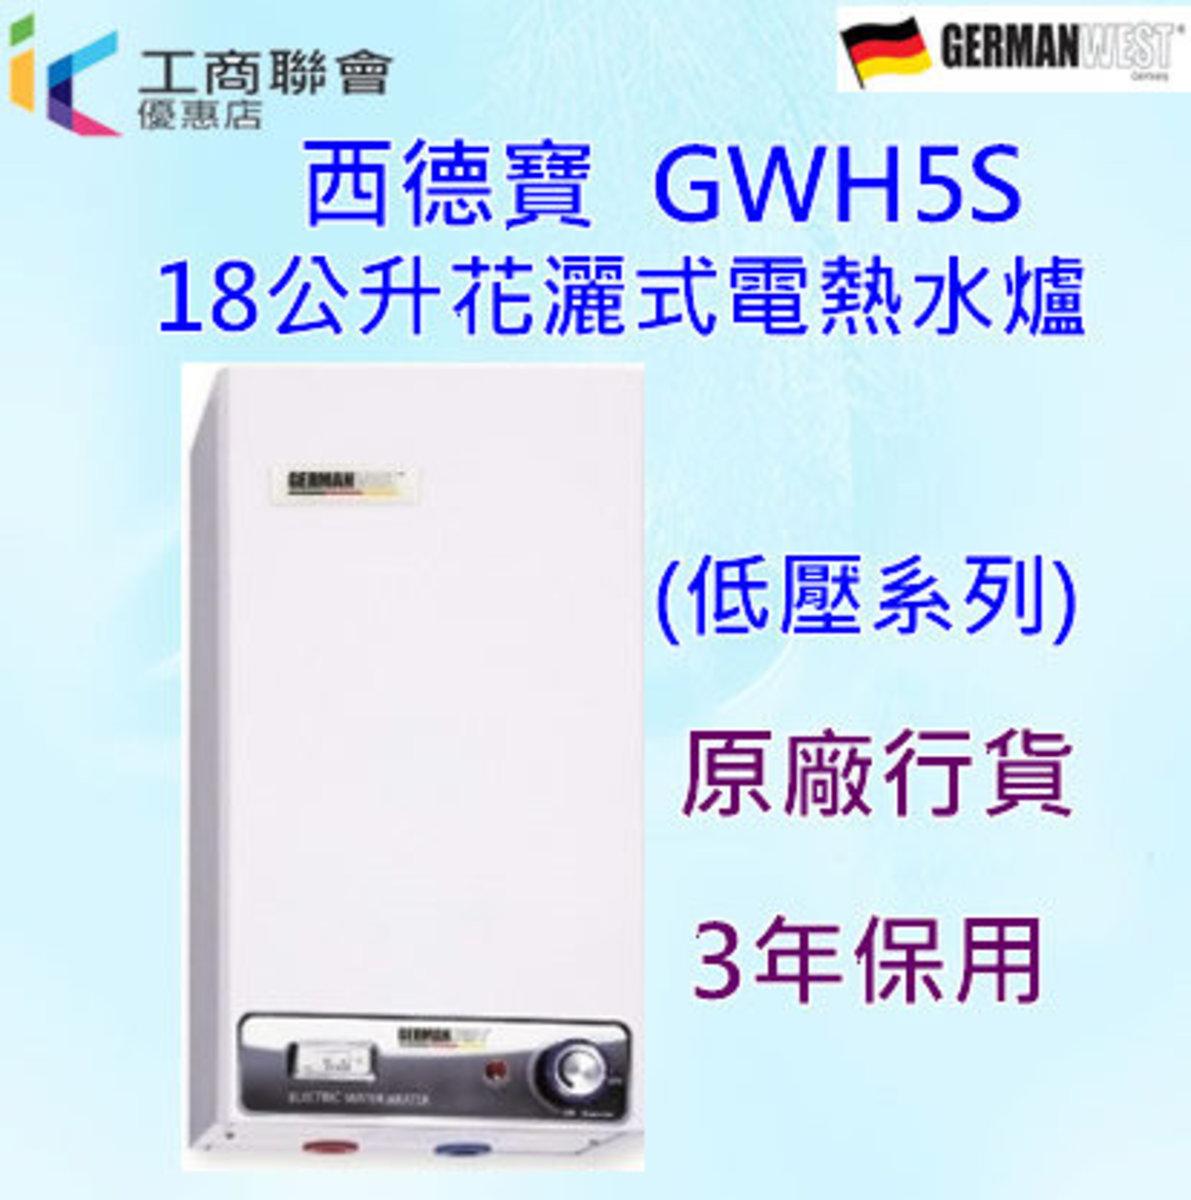 German West  GWH5S 18公升 花灑式電熱水爐